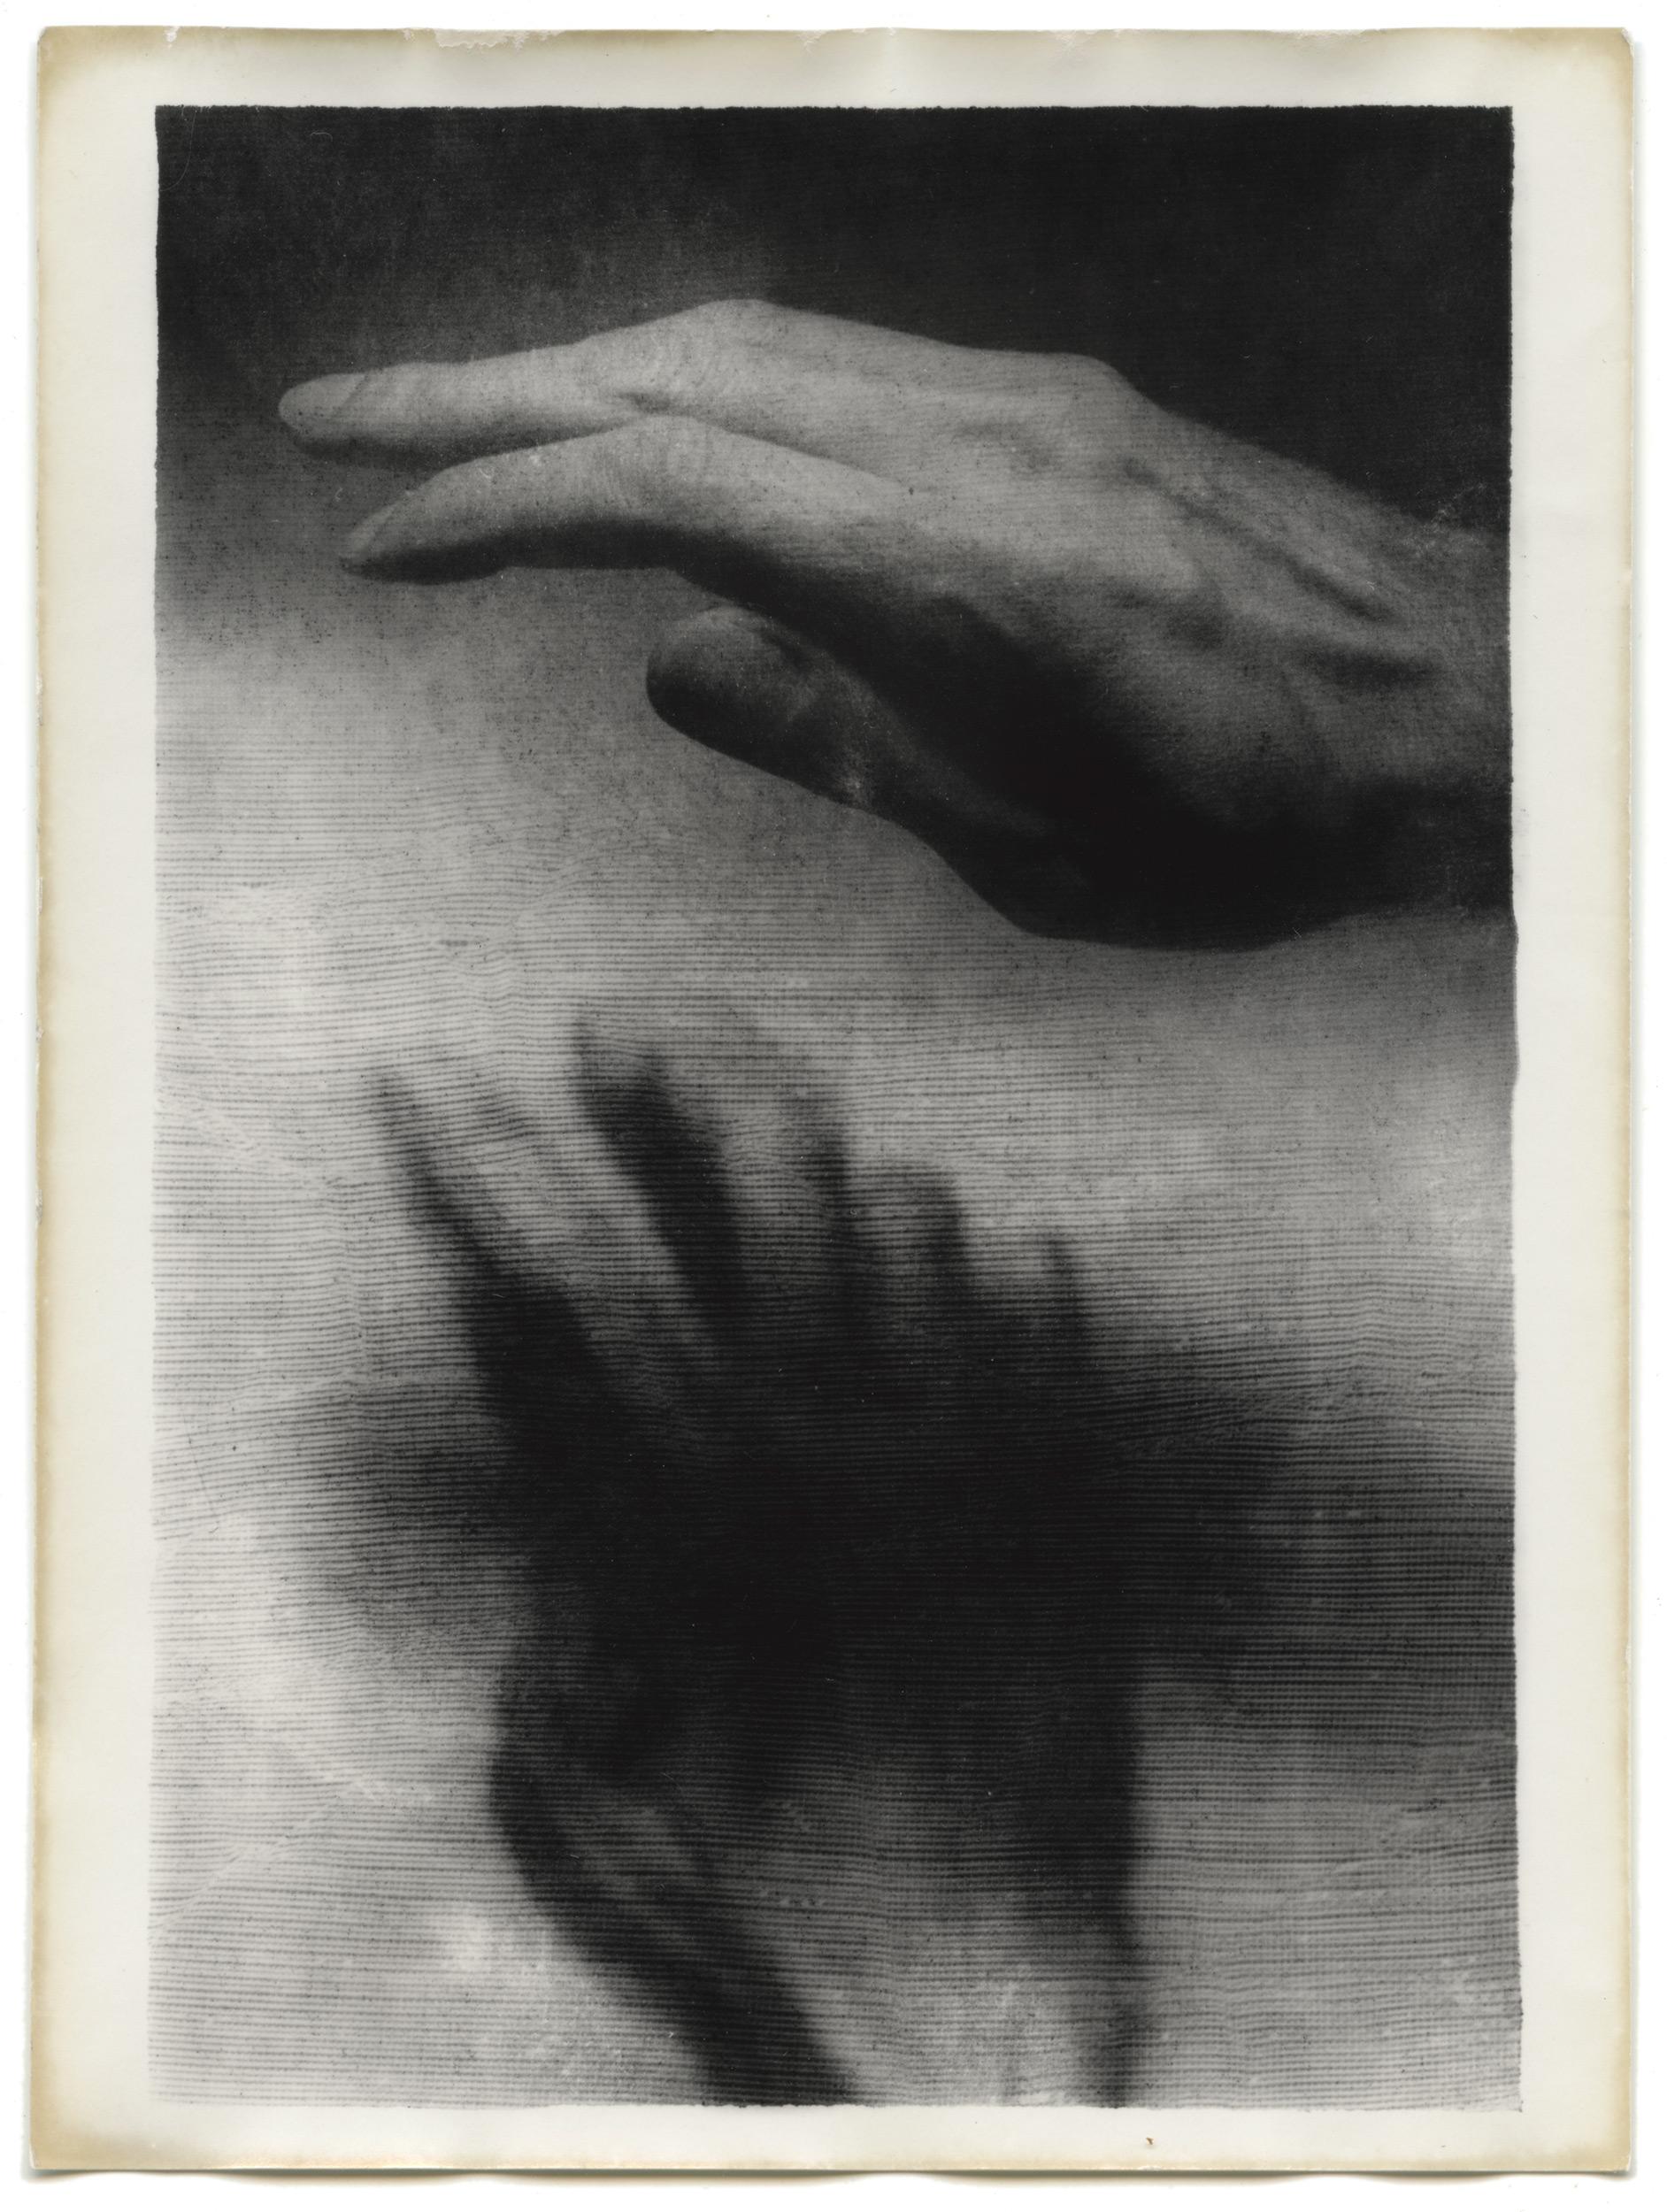 noncorpum 19, hand and hand